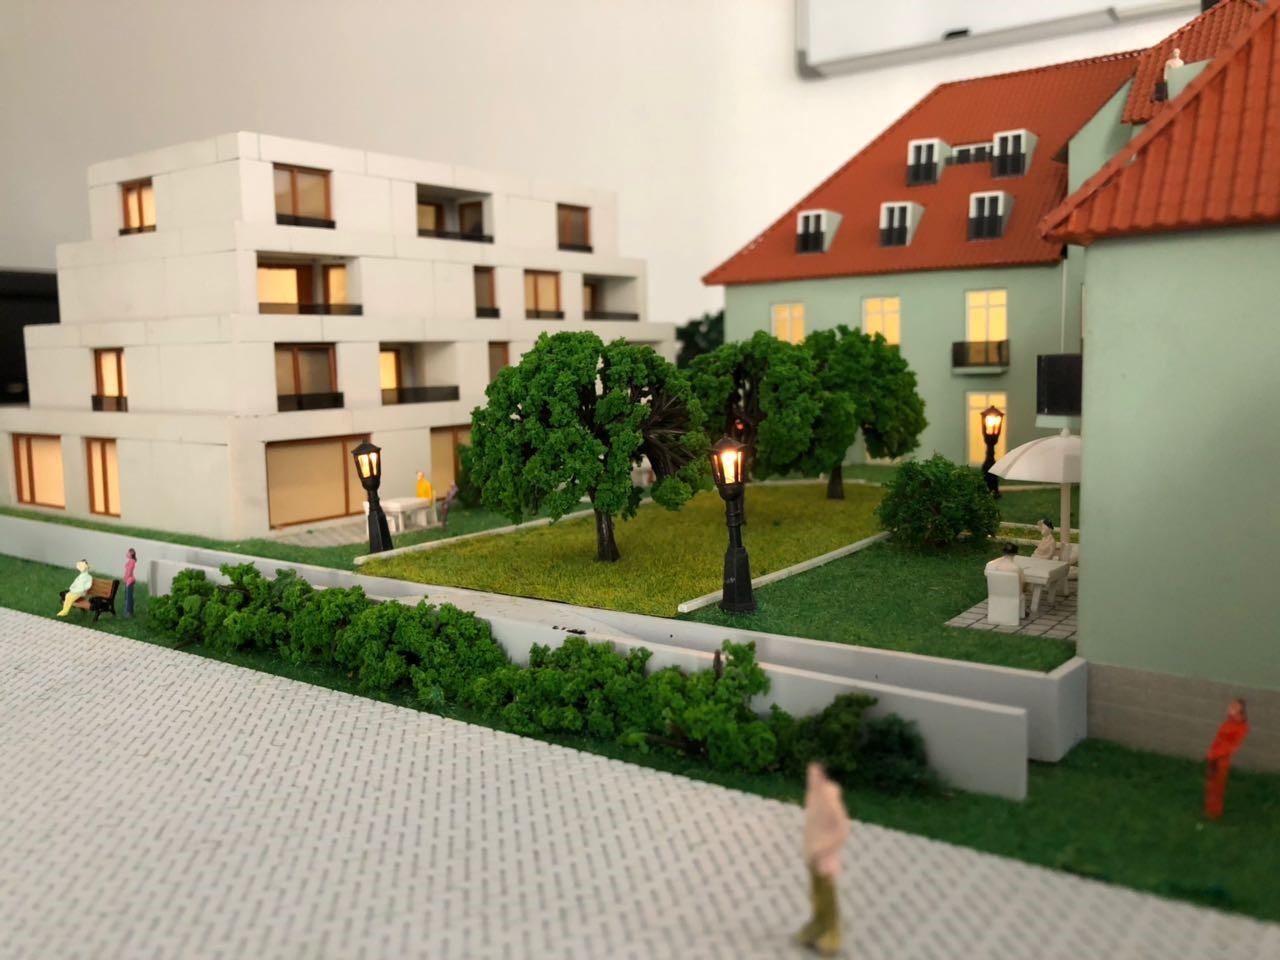 Architekturmodellbau Neubau